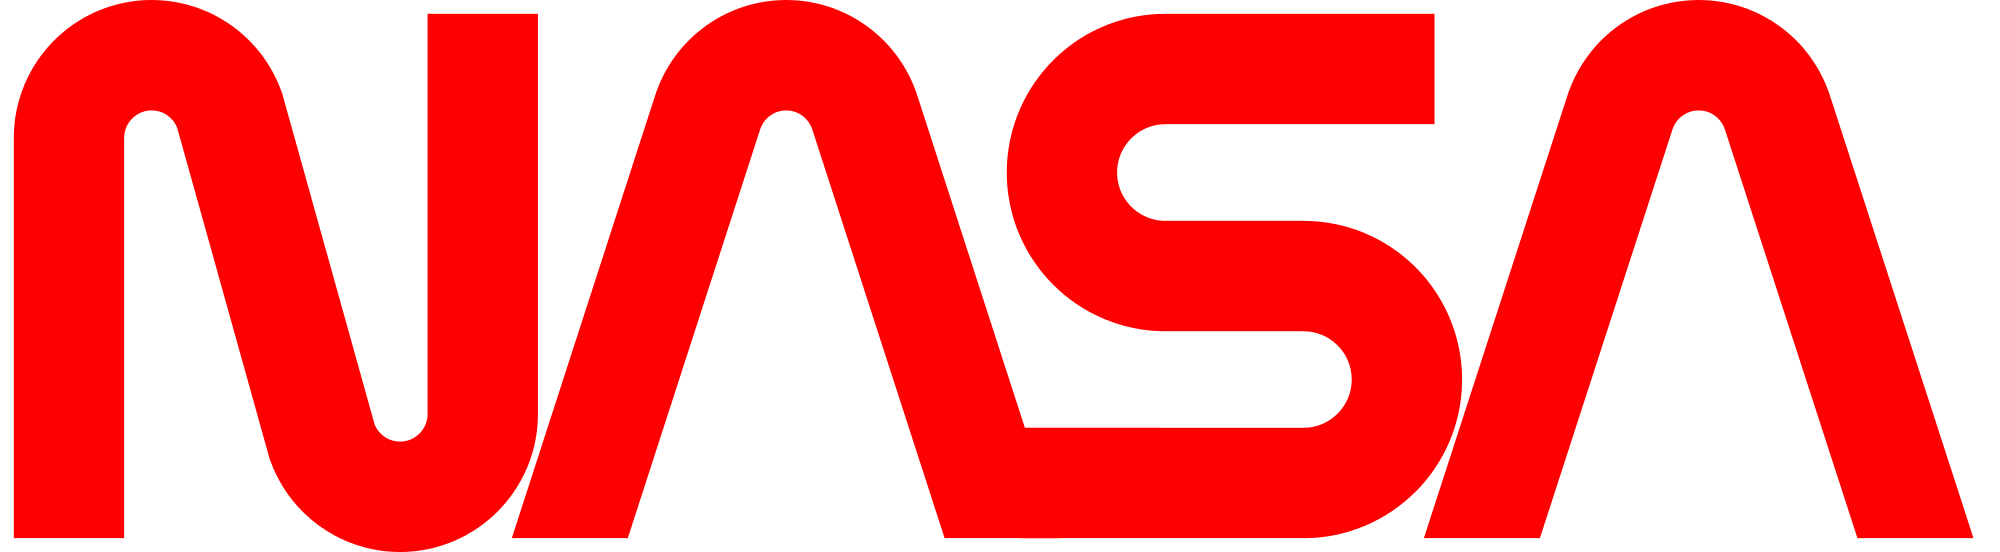 2000x552 Filenasa Worm Logo.svg